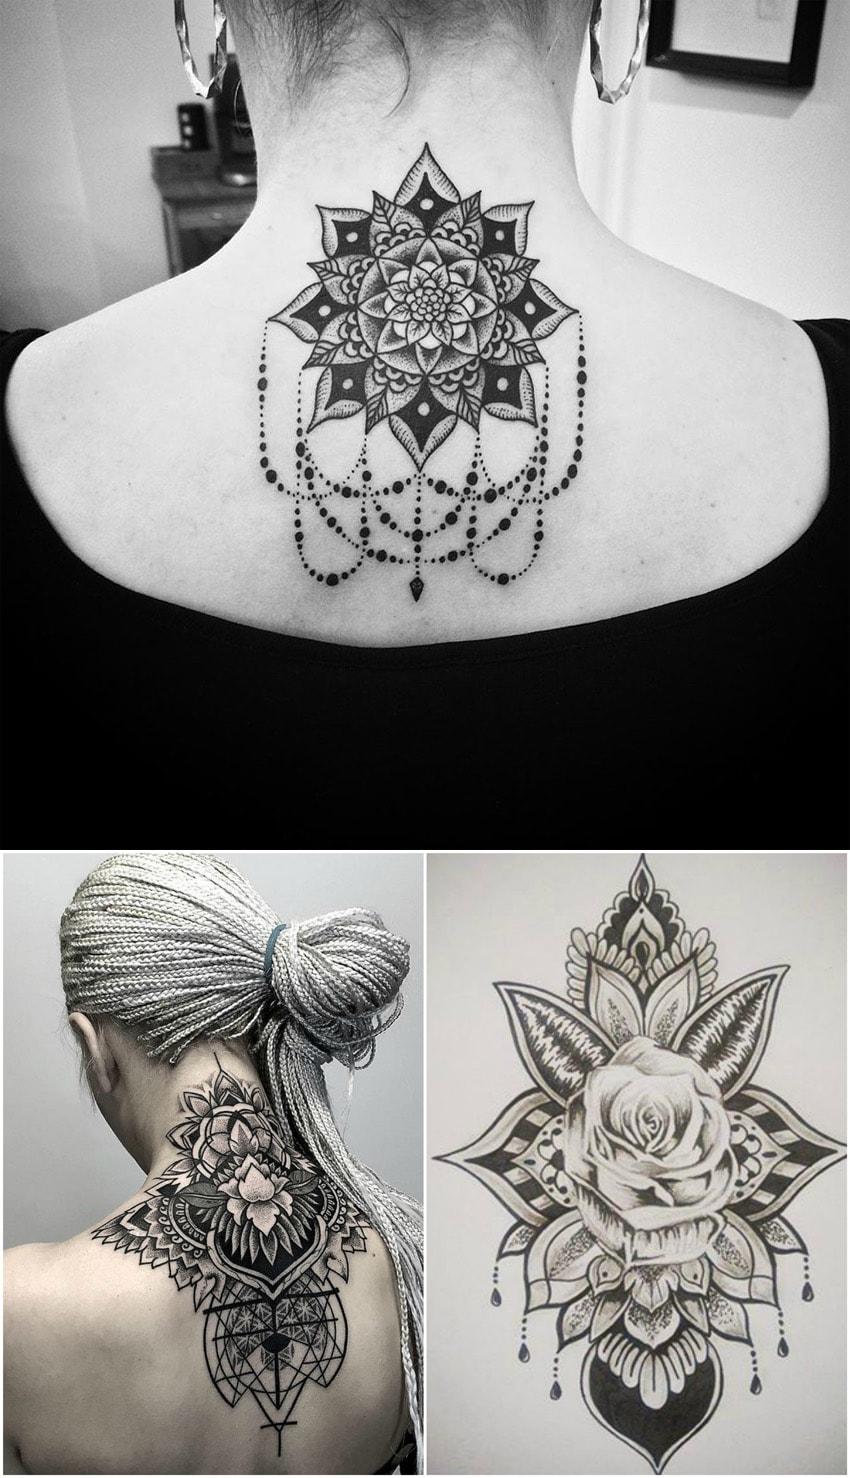 neck-floral-designs-tattoos